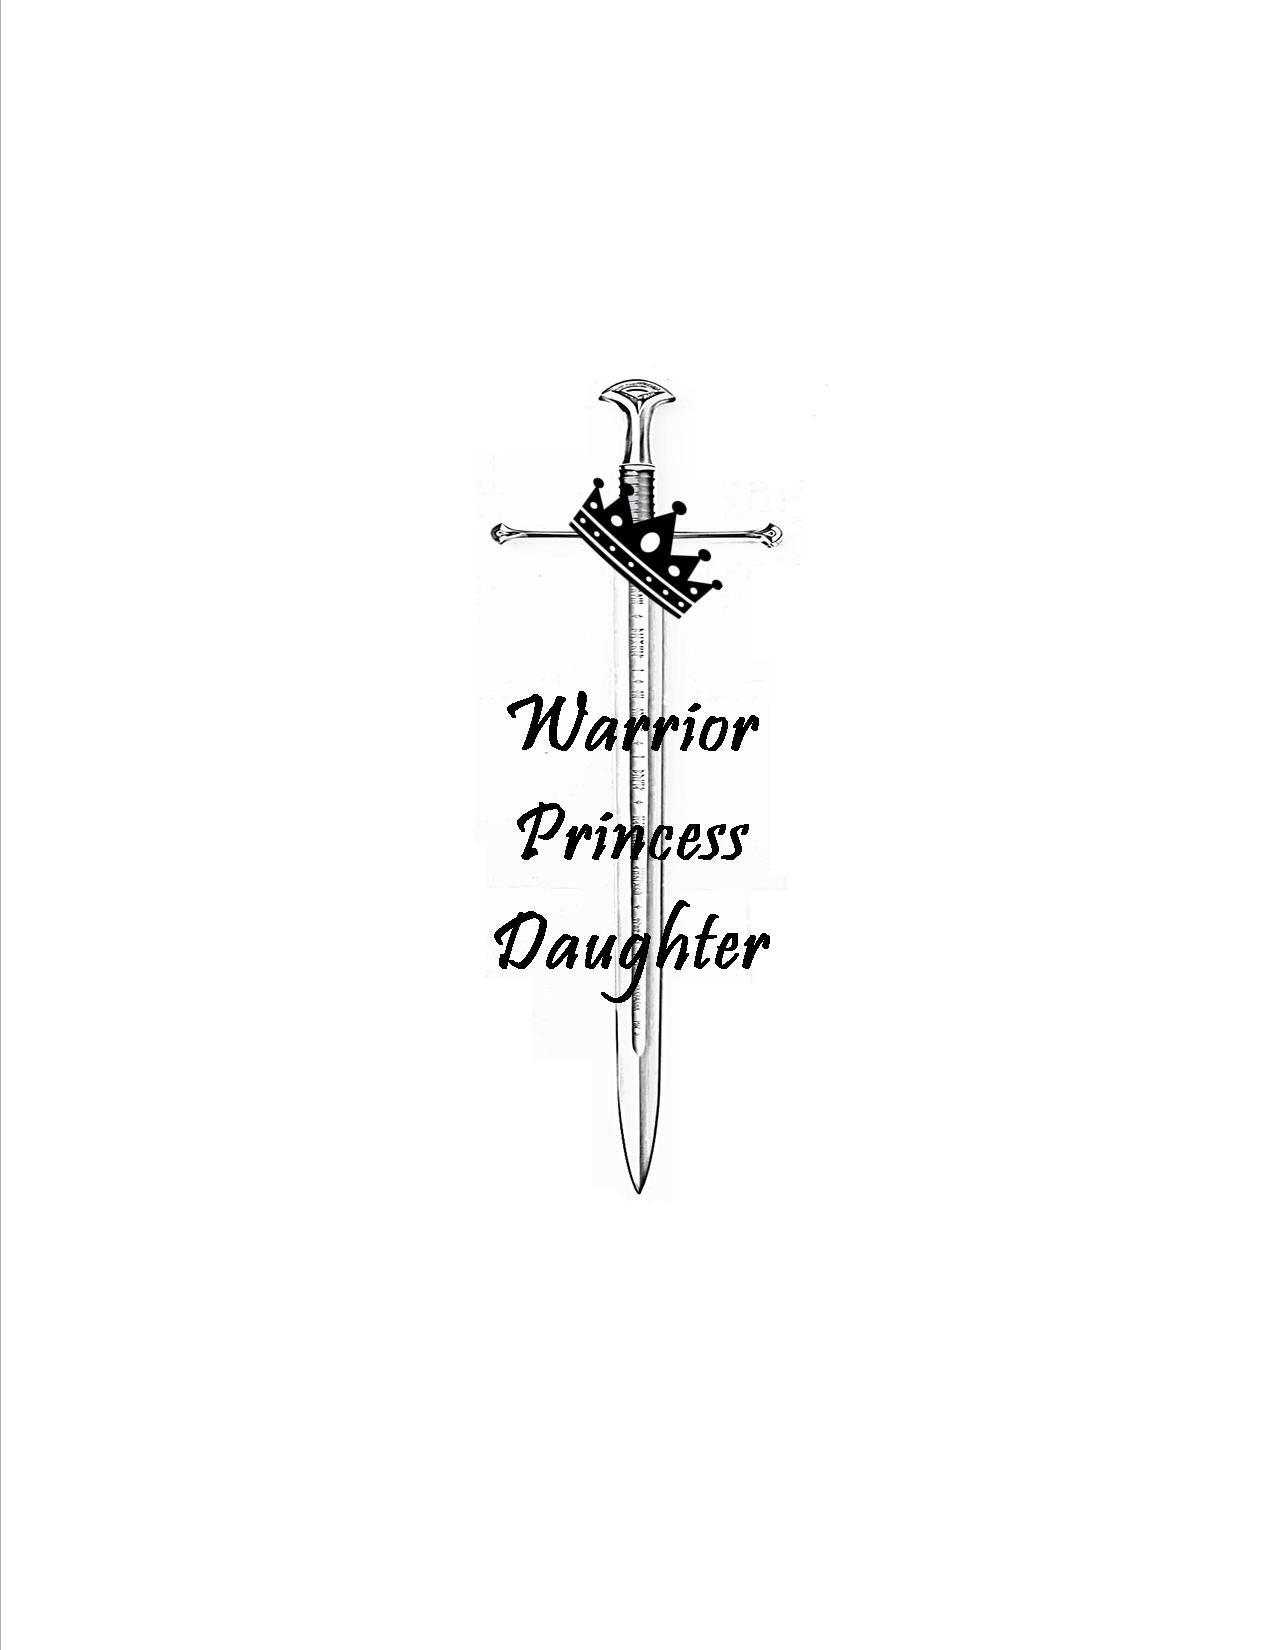 Warrior Symbol Tattoos : warrior, symbol, tattoos, Warrior, Princess, Daughter, Princess,, Tattoos,, Skull, Tattoo